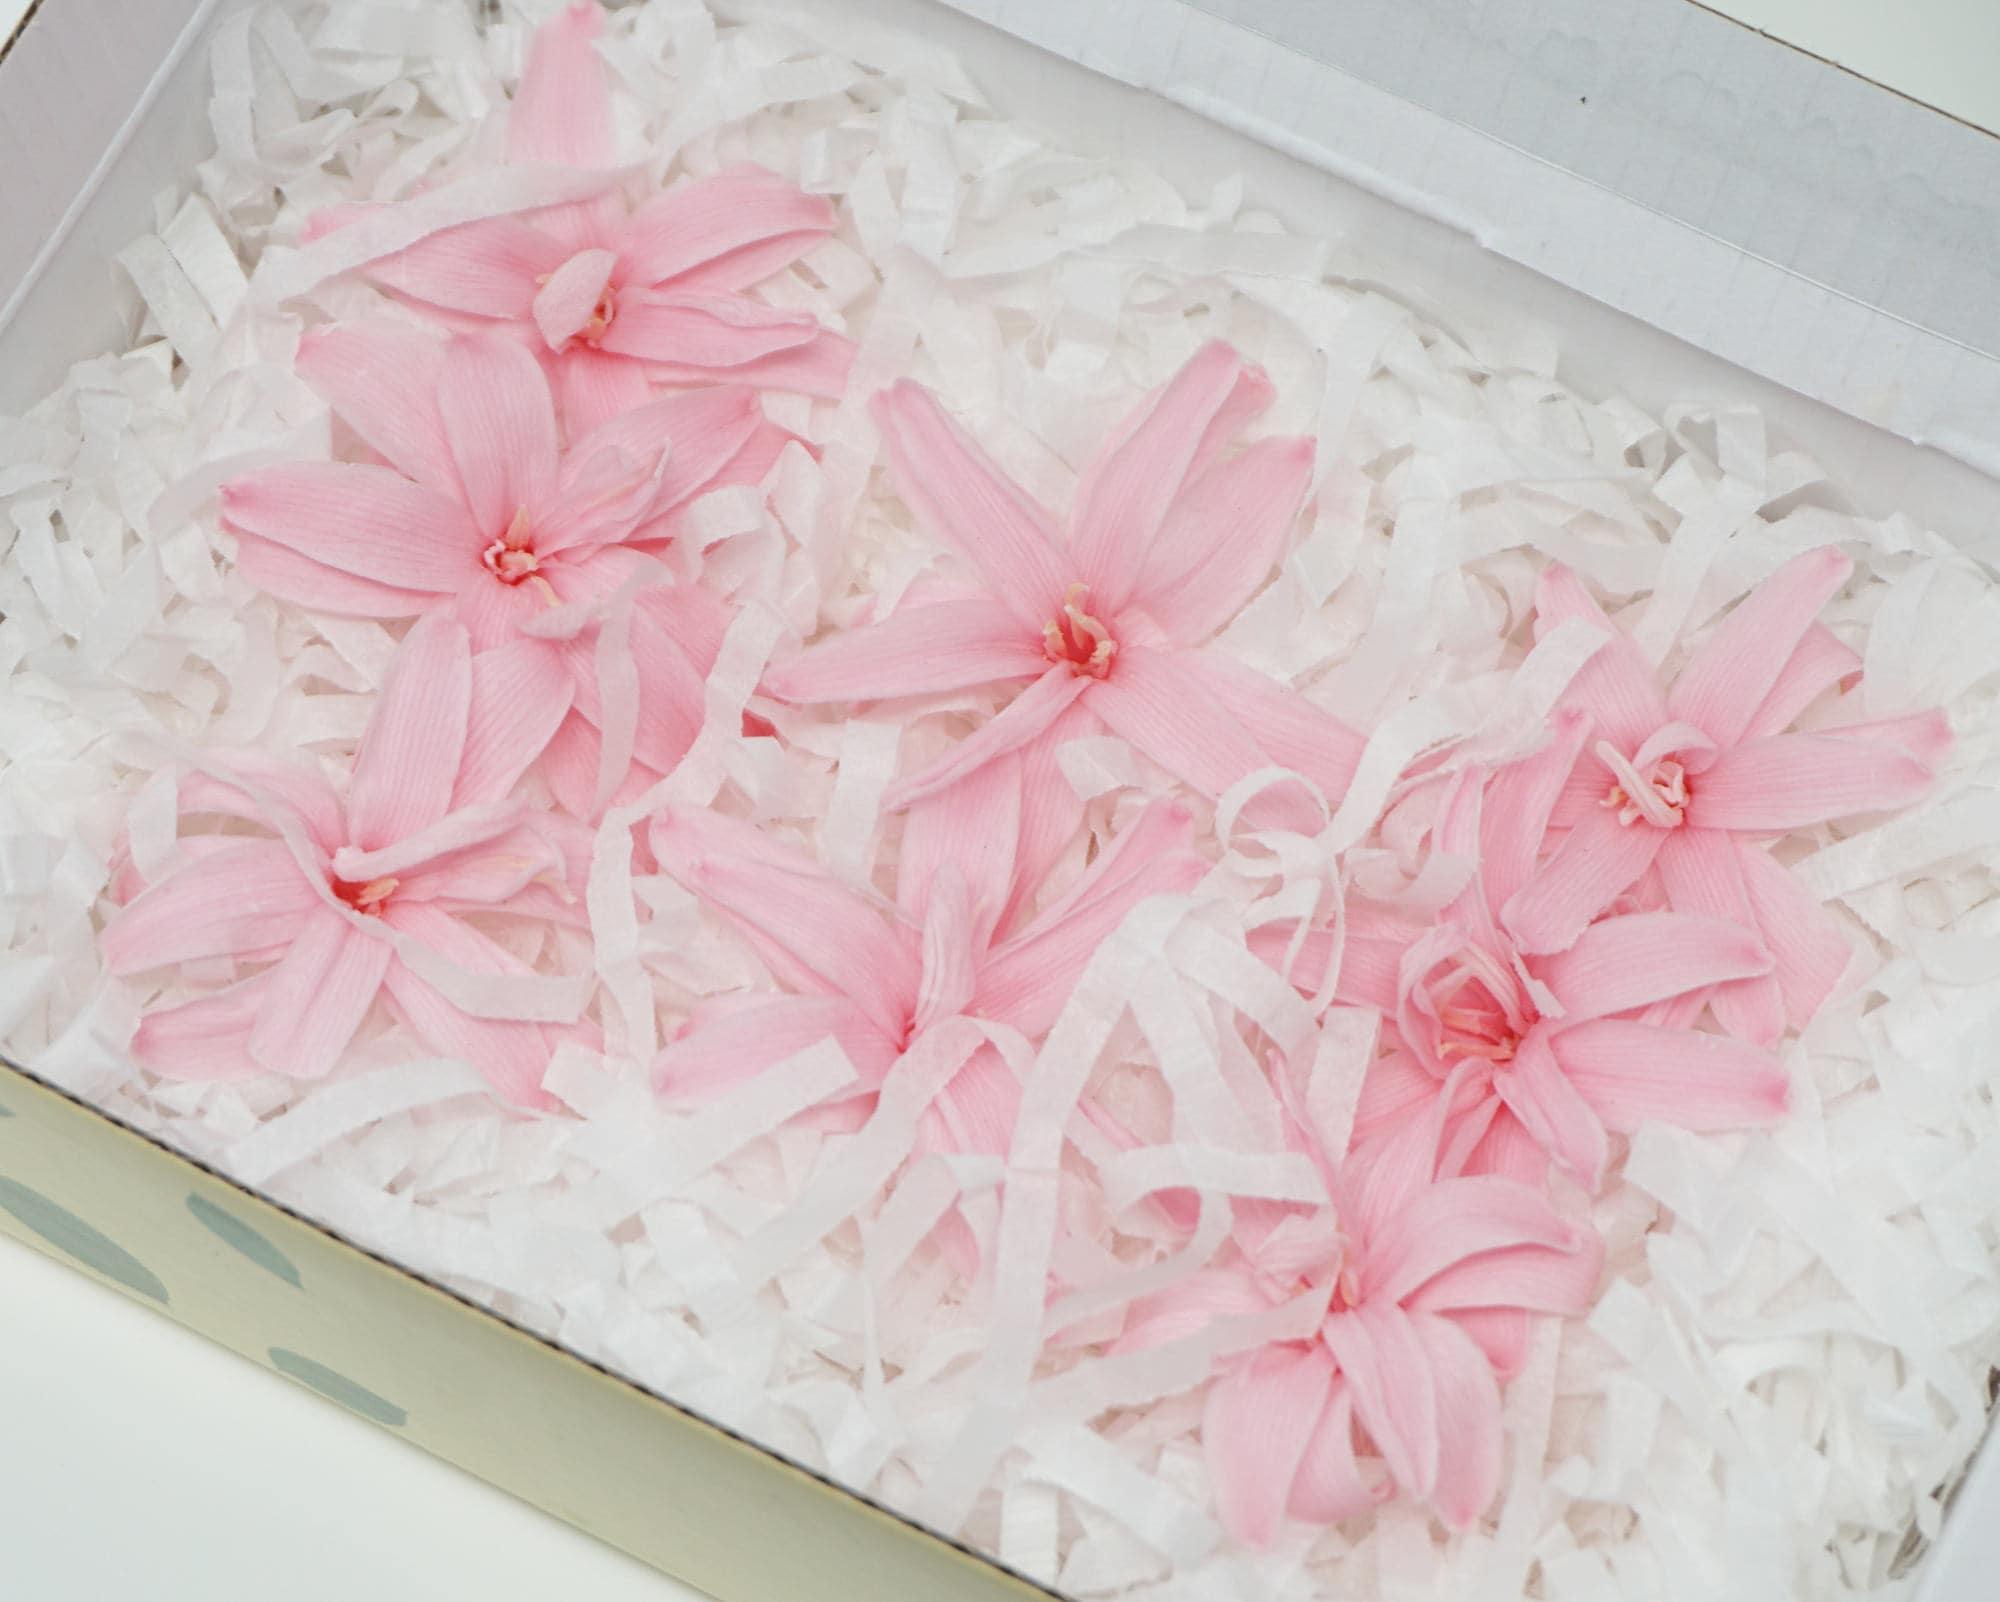 Baby pink tuberose 8 tuberose preserved flowers home decor   Etsy